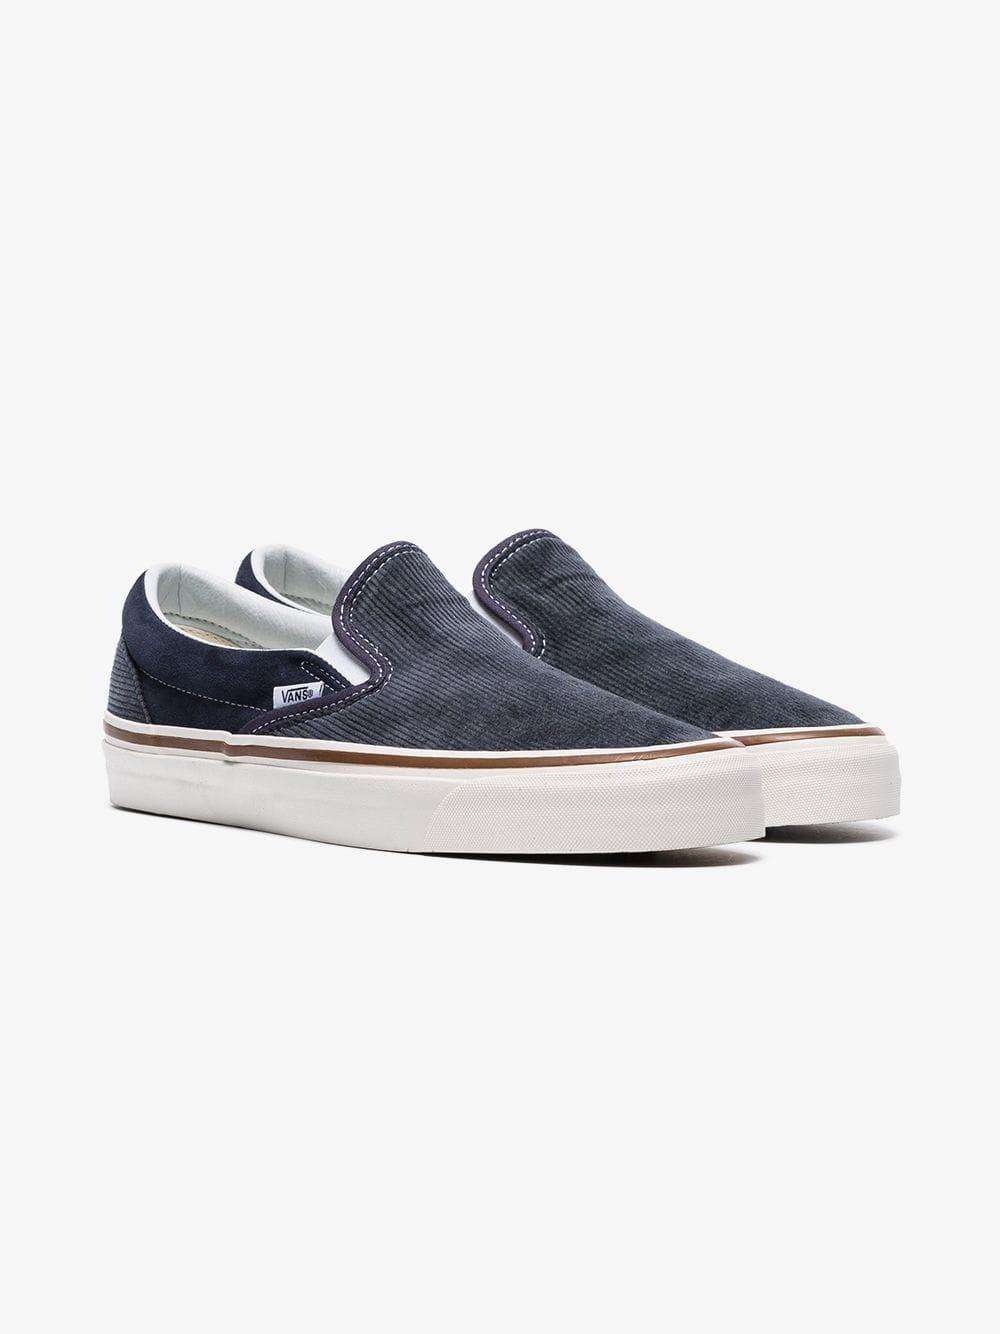 026305313d4188 Lyst - Vans Navy Blue And Grey 98 Dx Corduroy Slip On Sneakers in ...